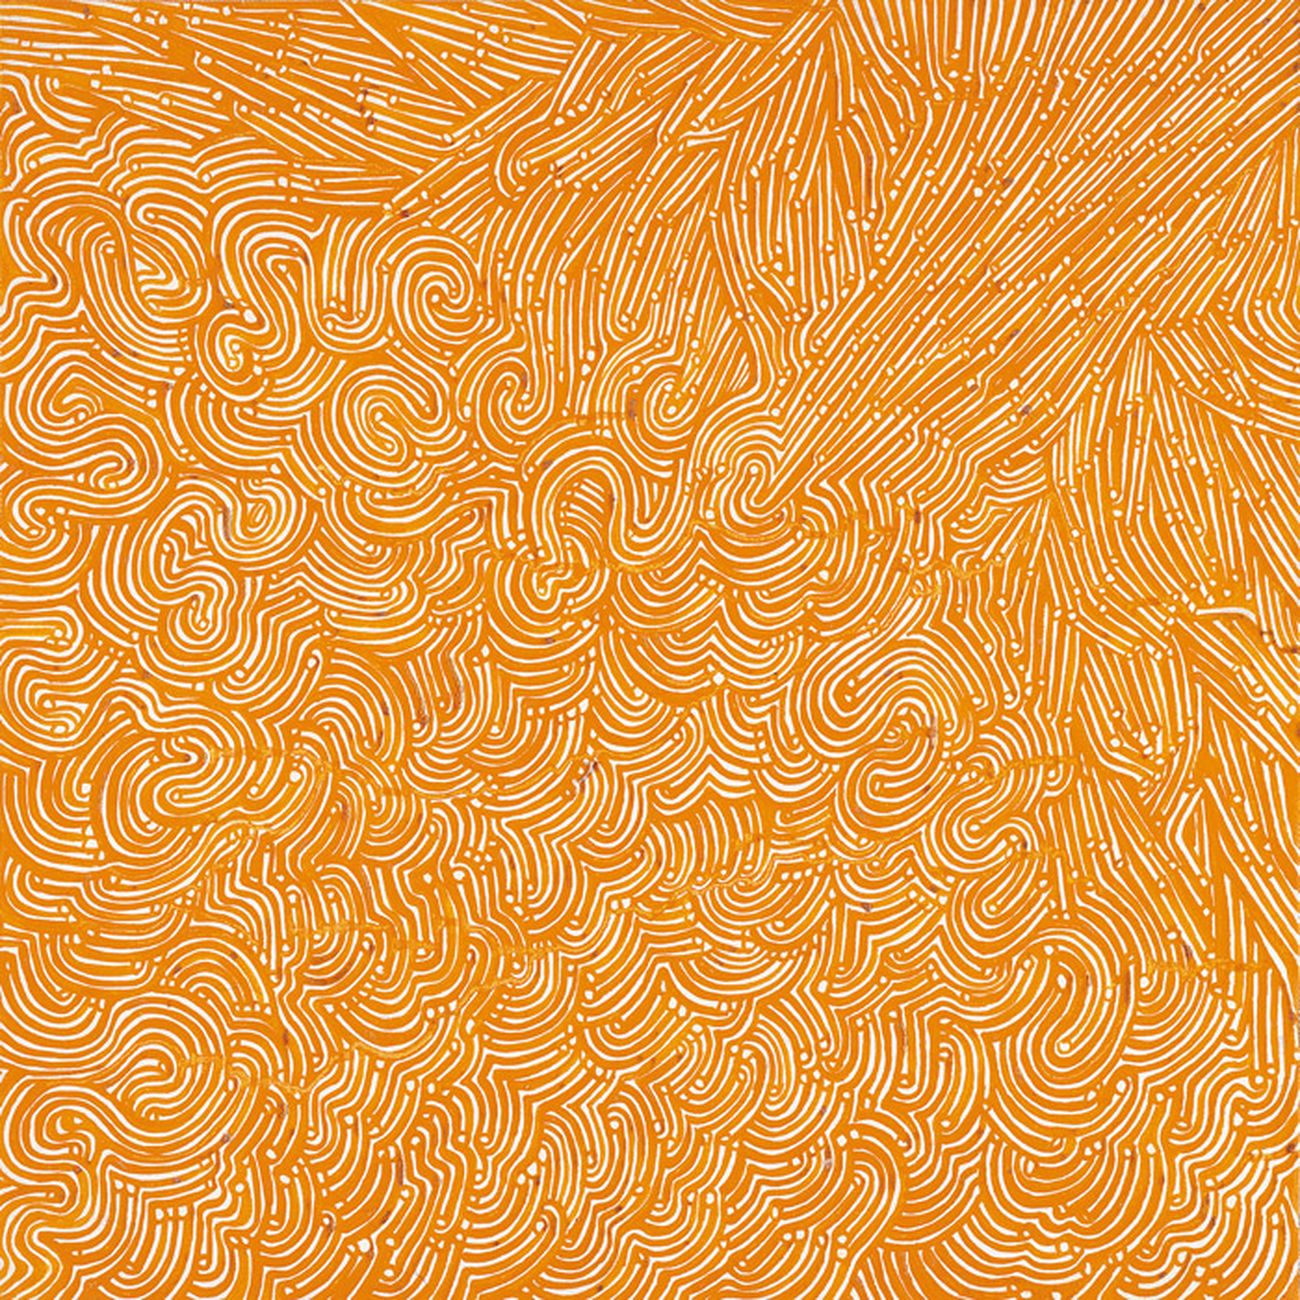 Francesco Polenghi, Senza titolo, 2006, 98 x 98 cm